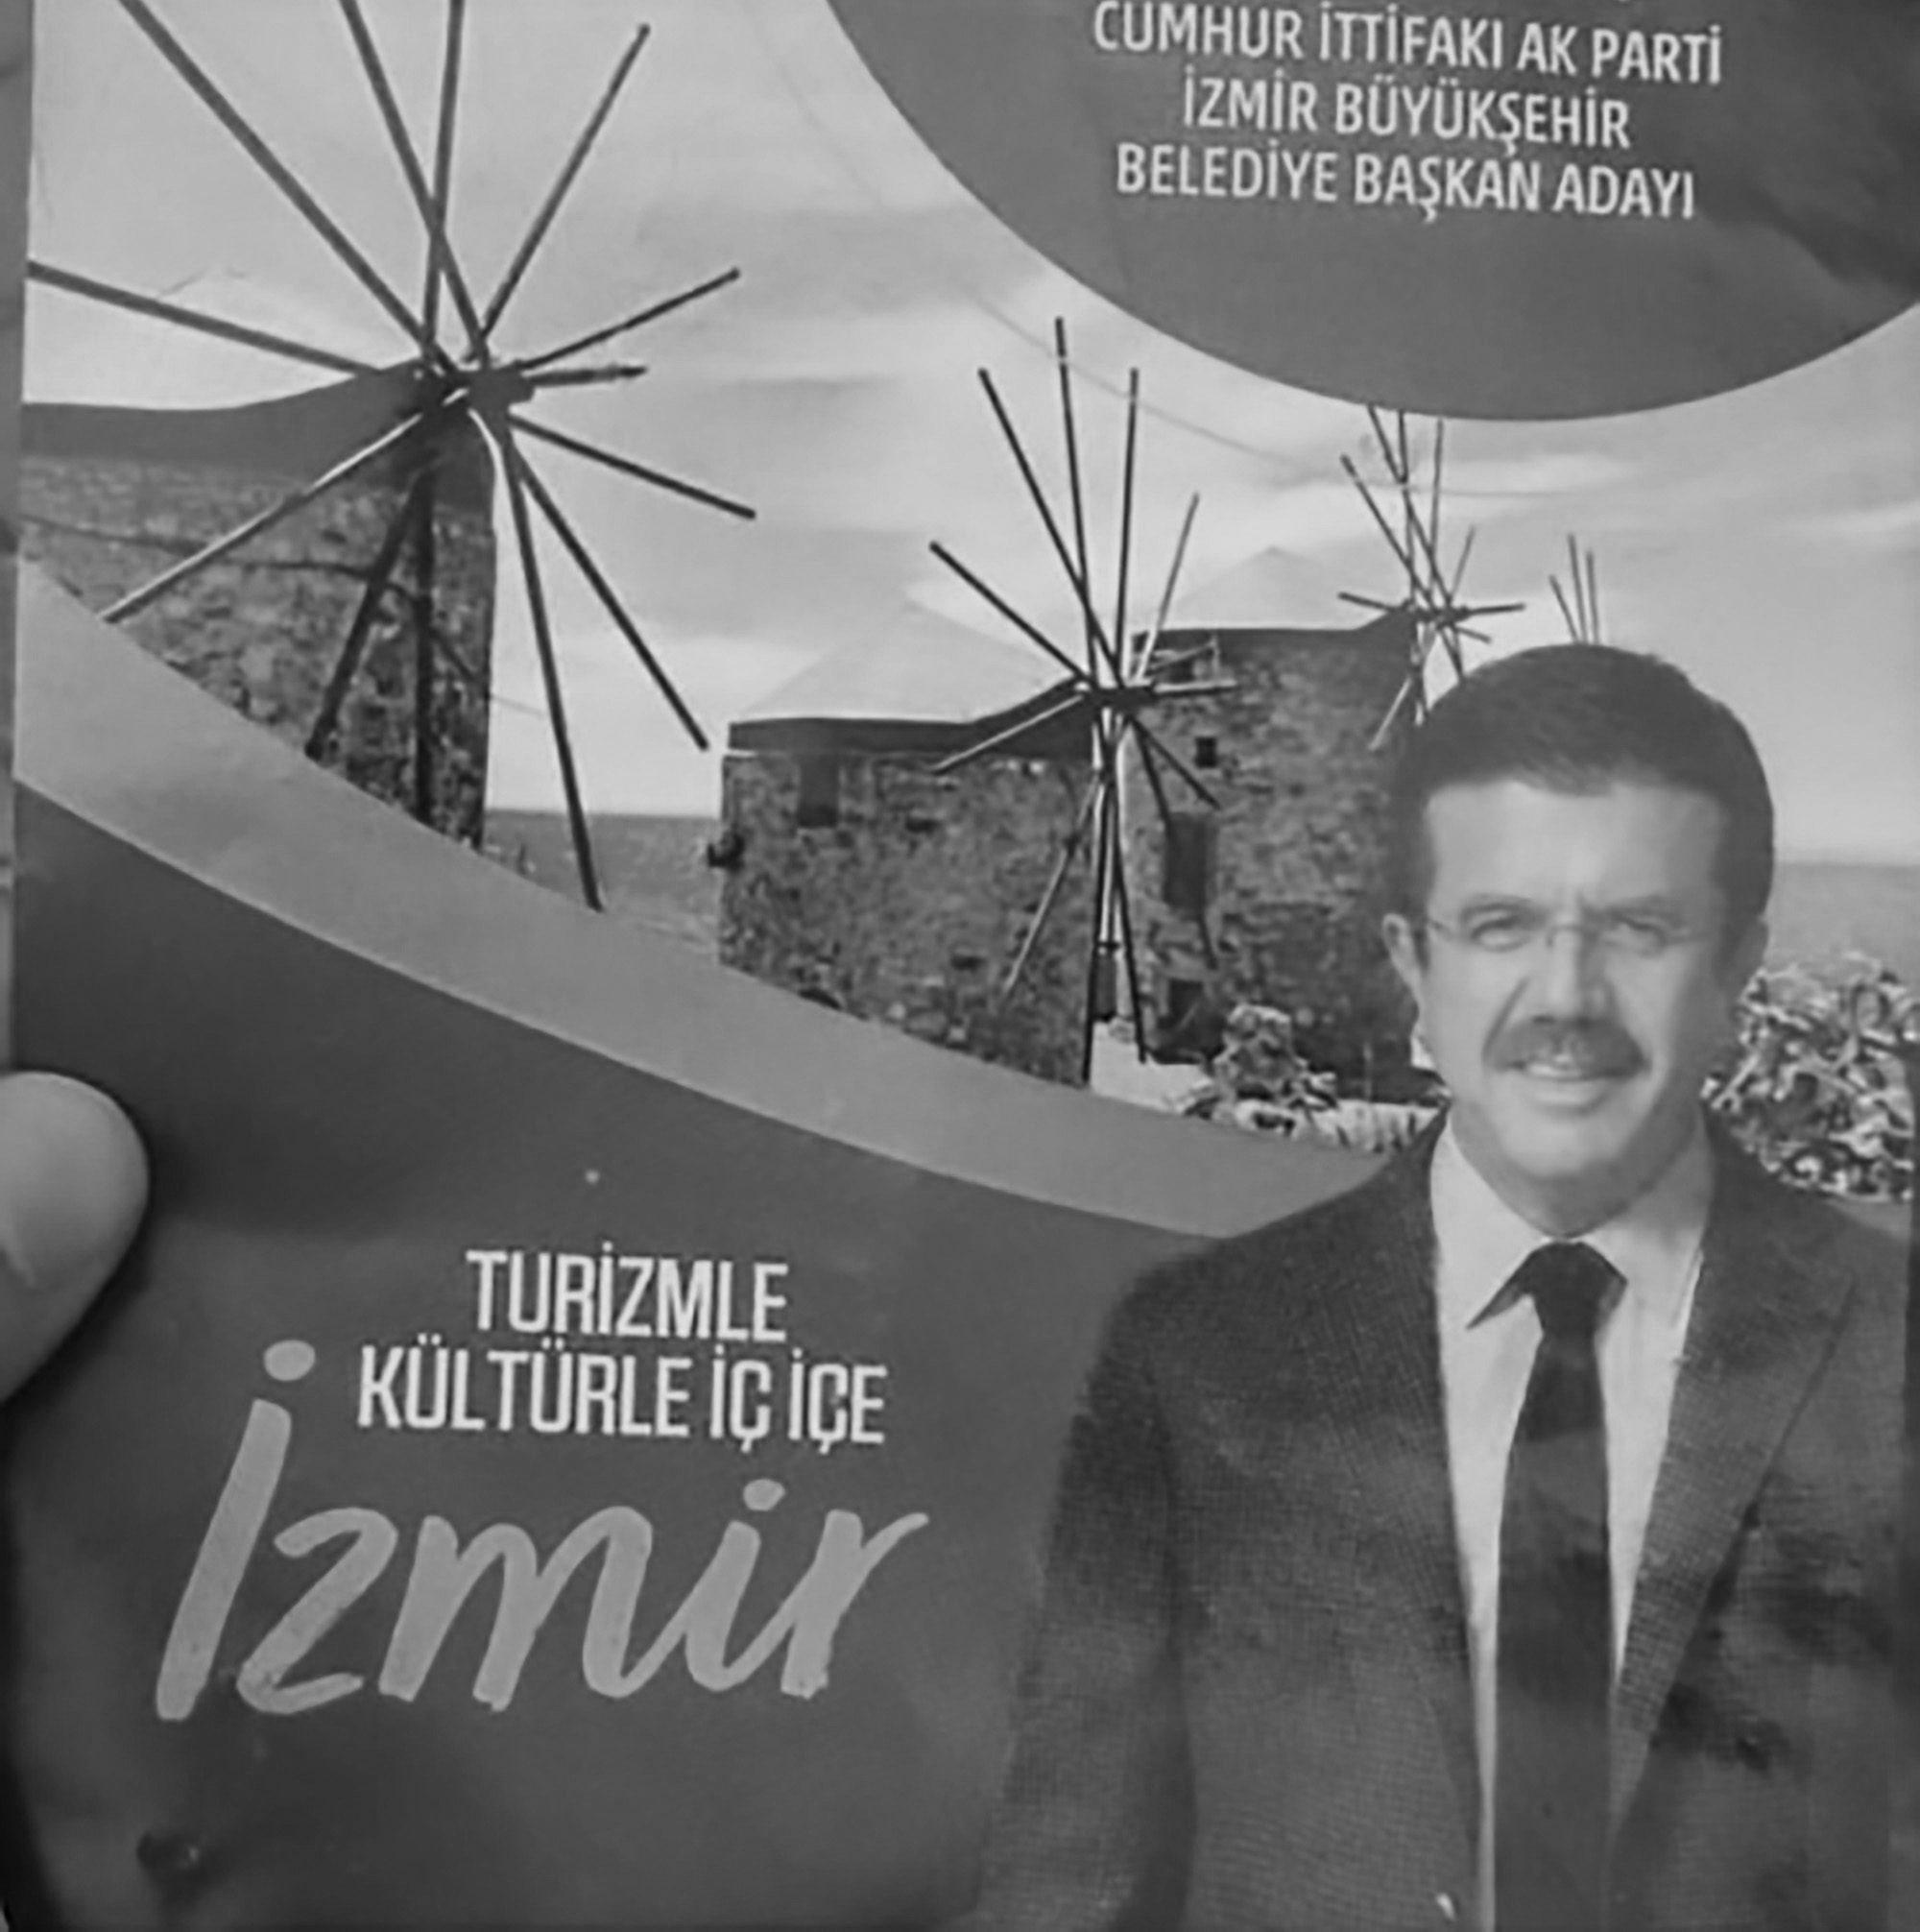 Turkish Candidate Uses Greek Island Photo On Manifesto